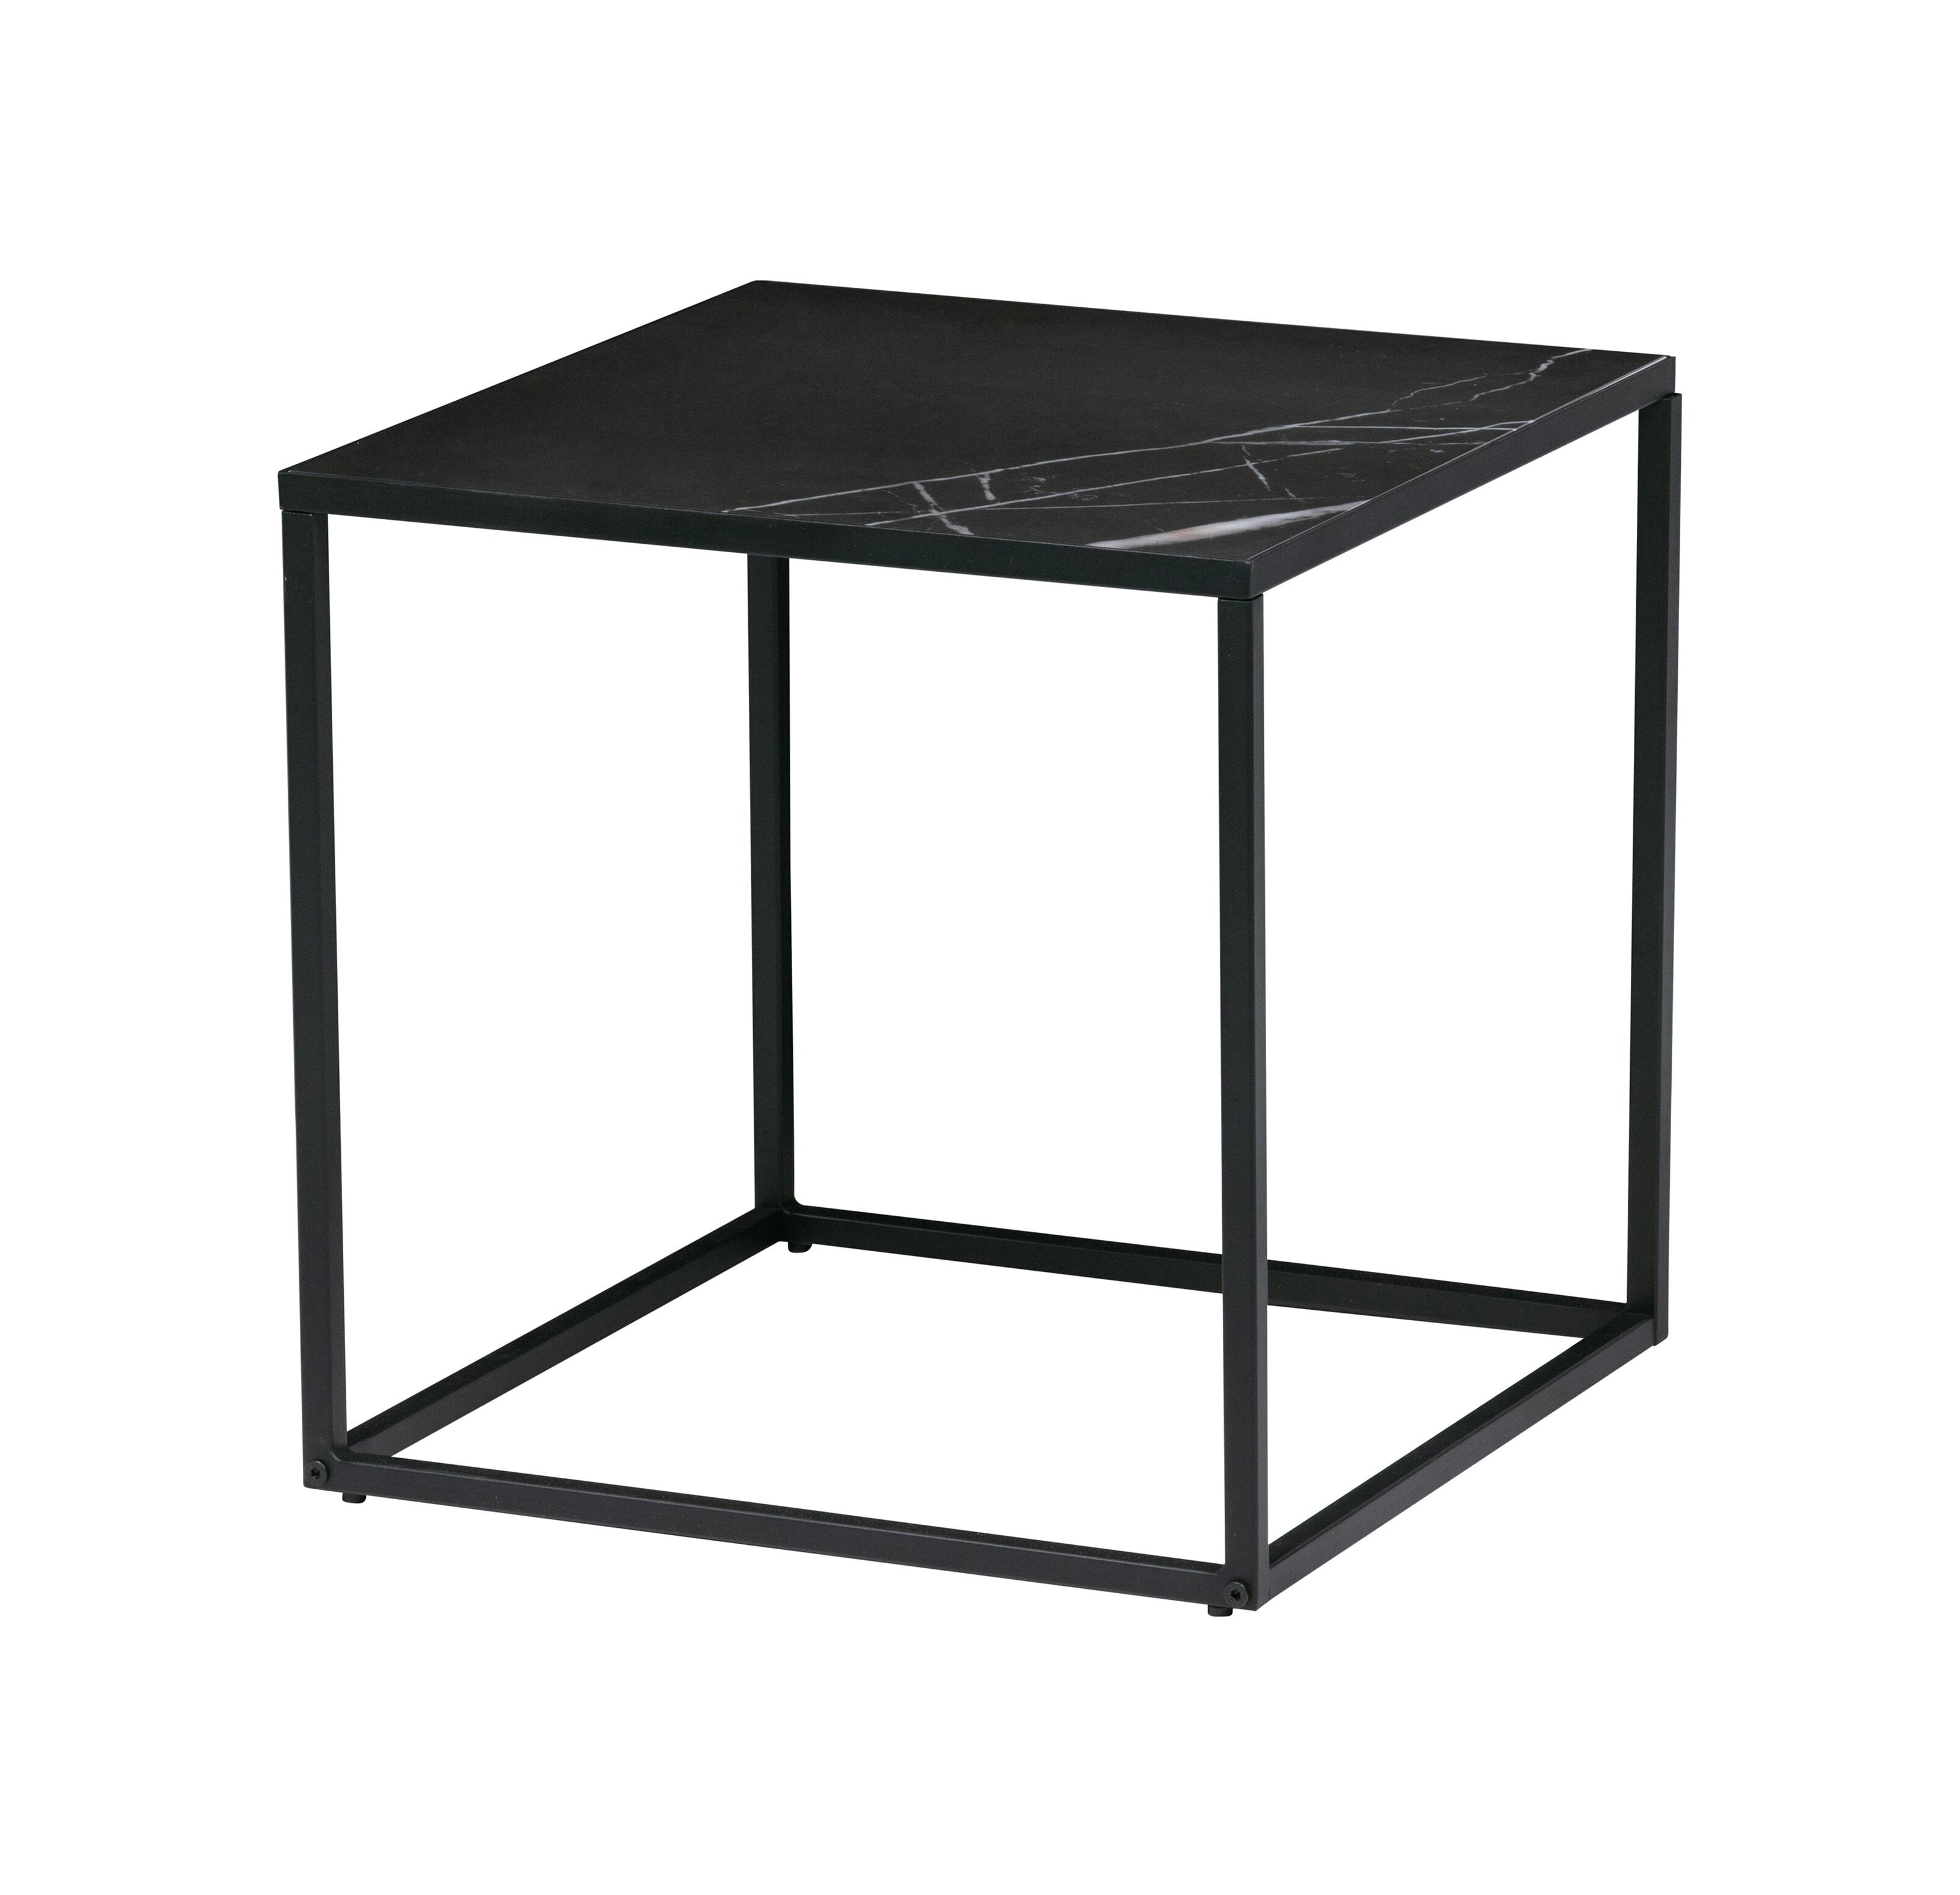 vtwonen Vierkante Bijzettafel 'Side M' Zwart marmer, 45 x 45cm